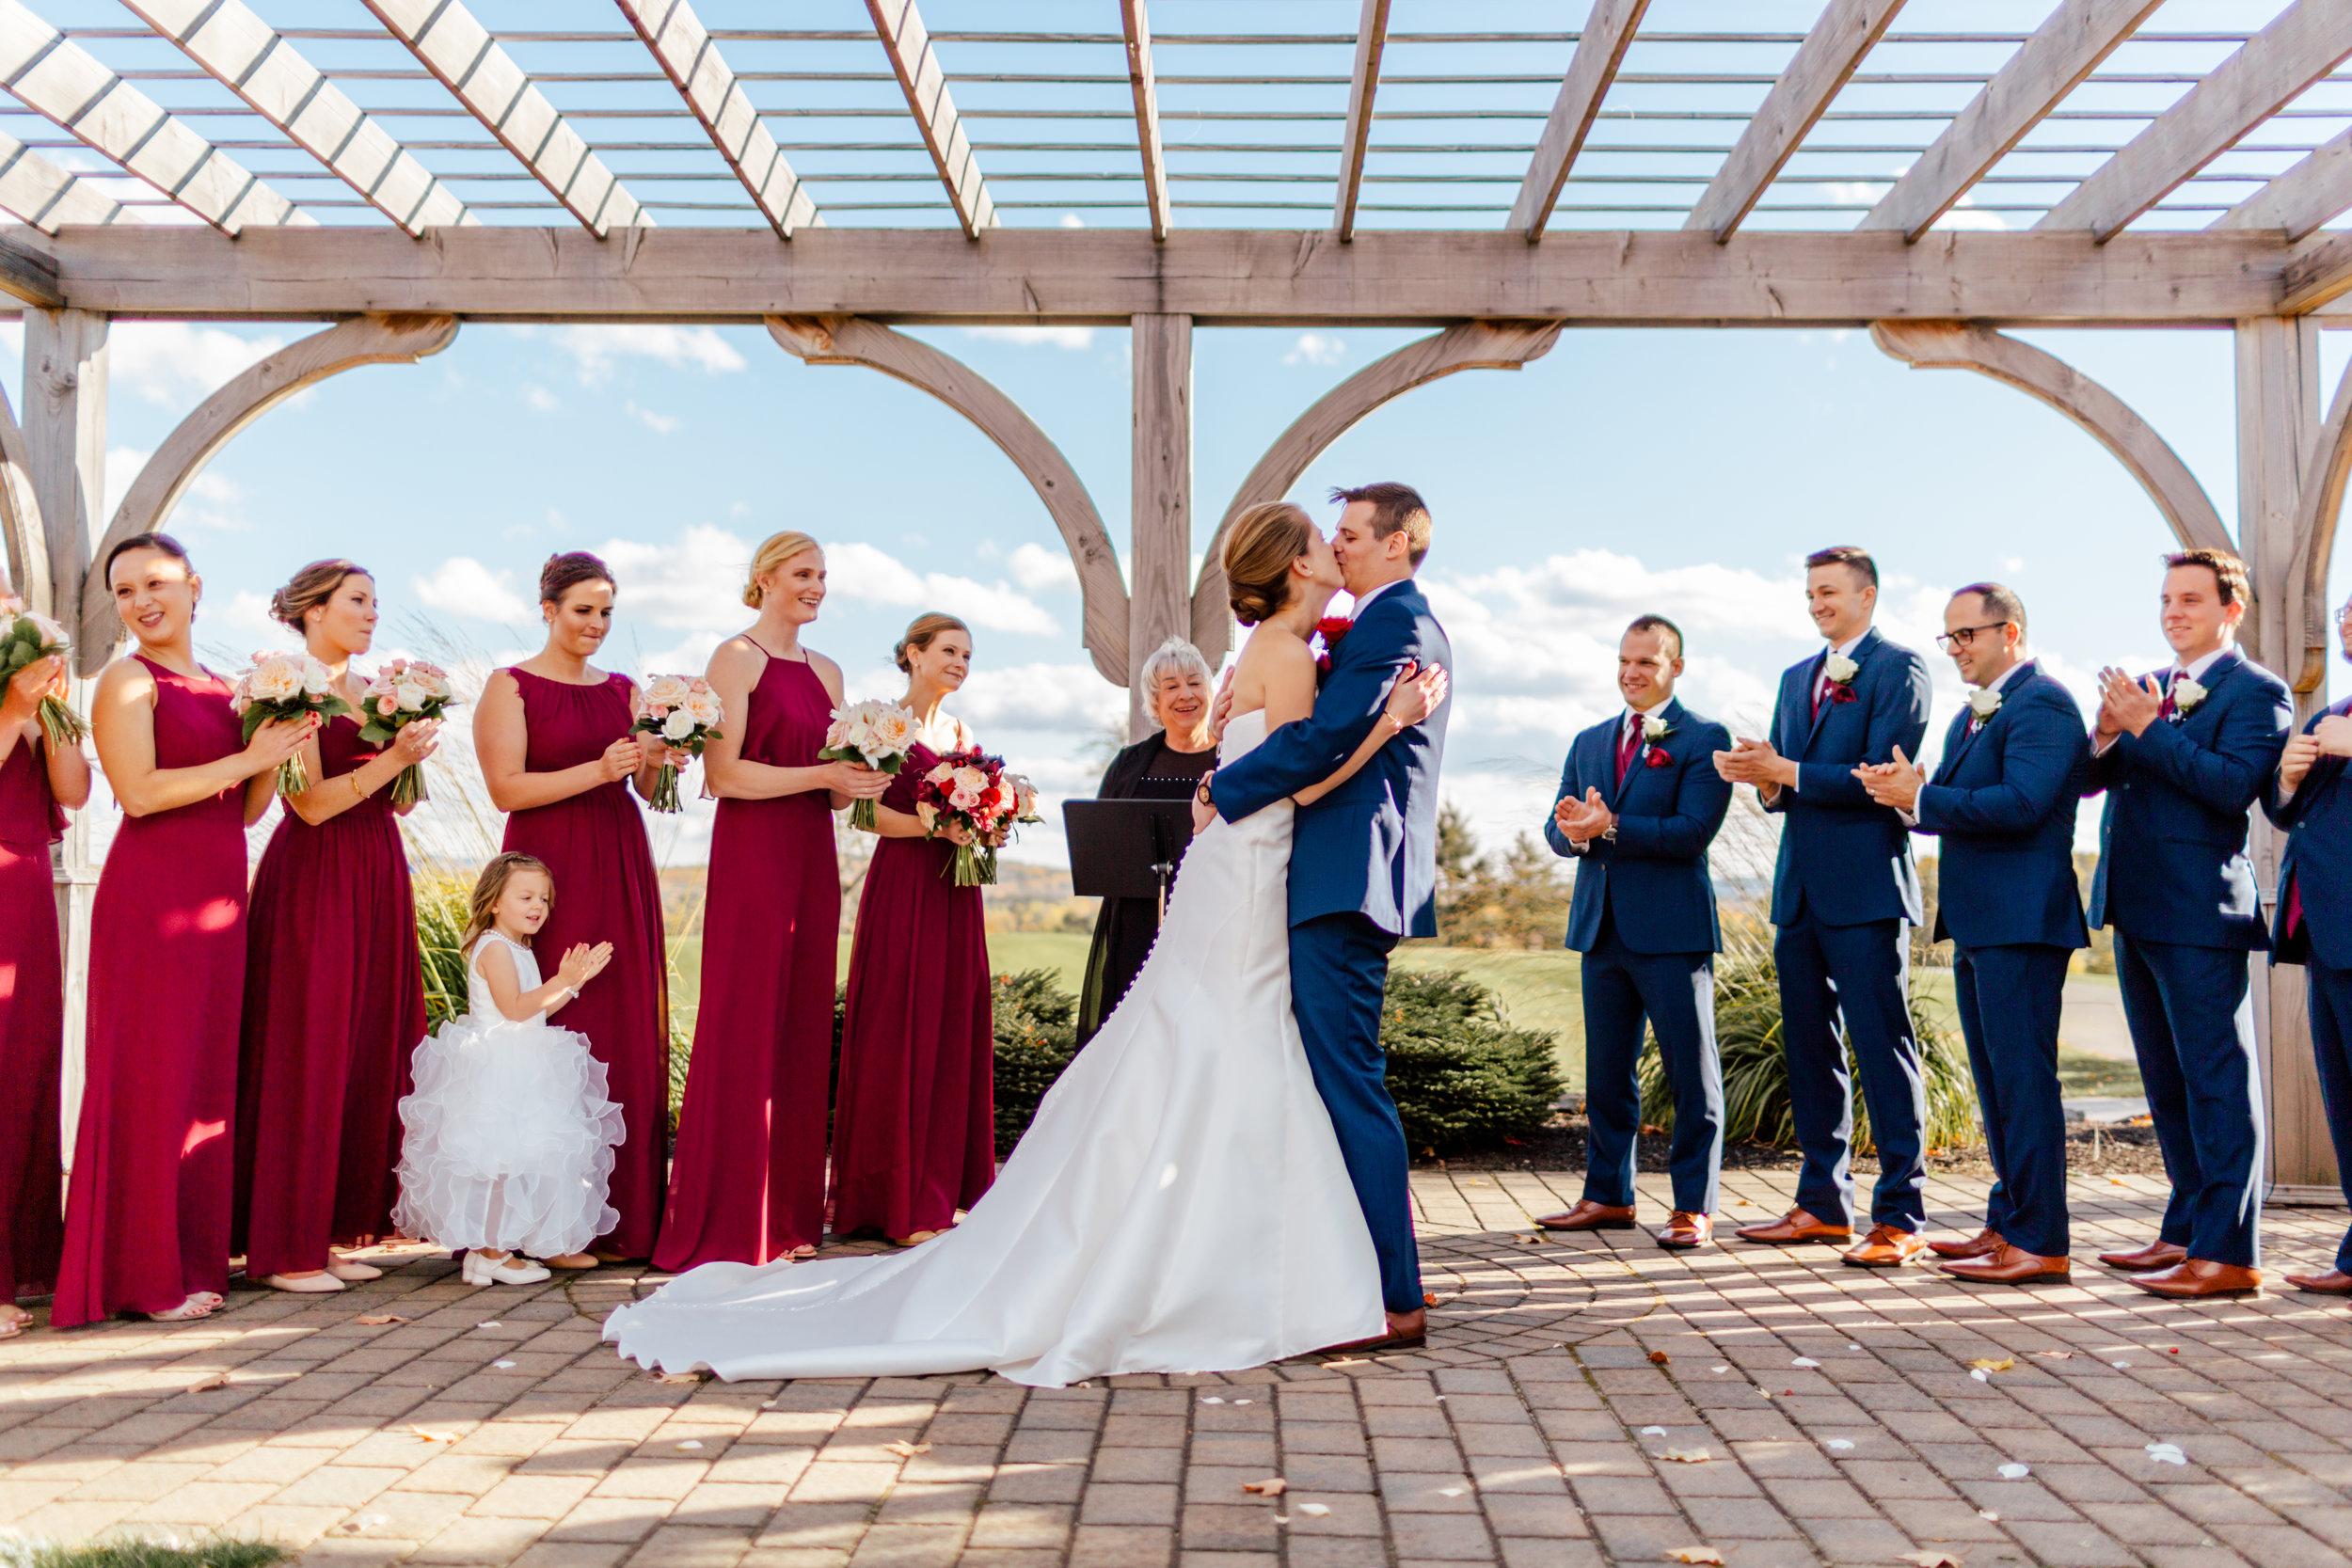 Jeff-and-Leslie-Wedding -8114.jpg